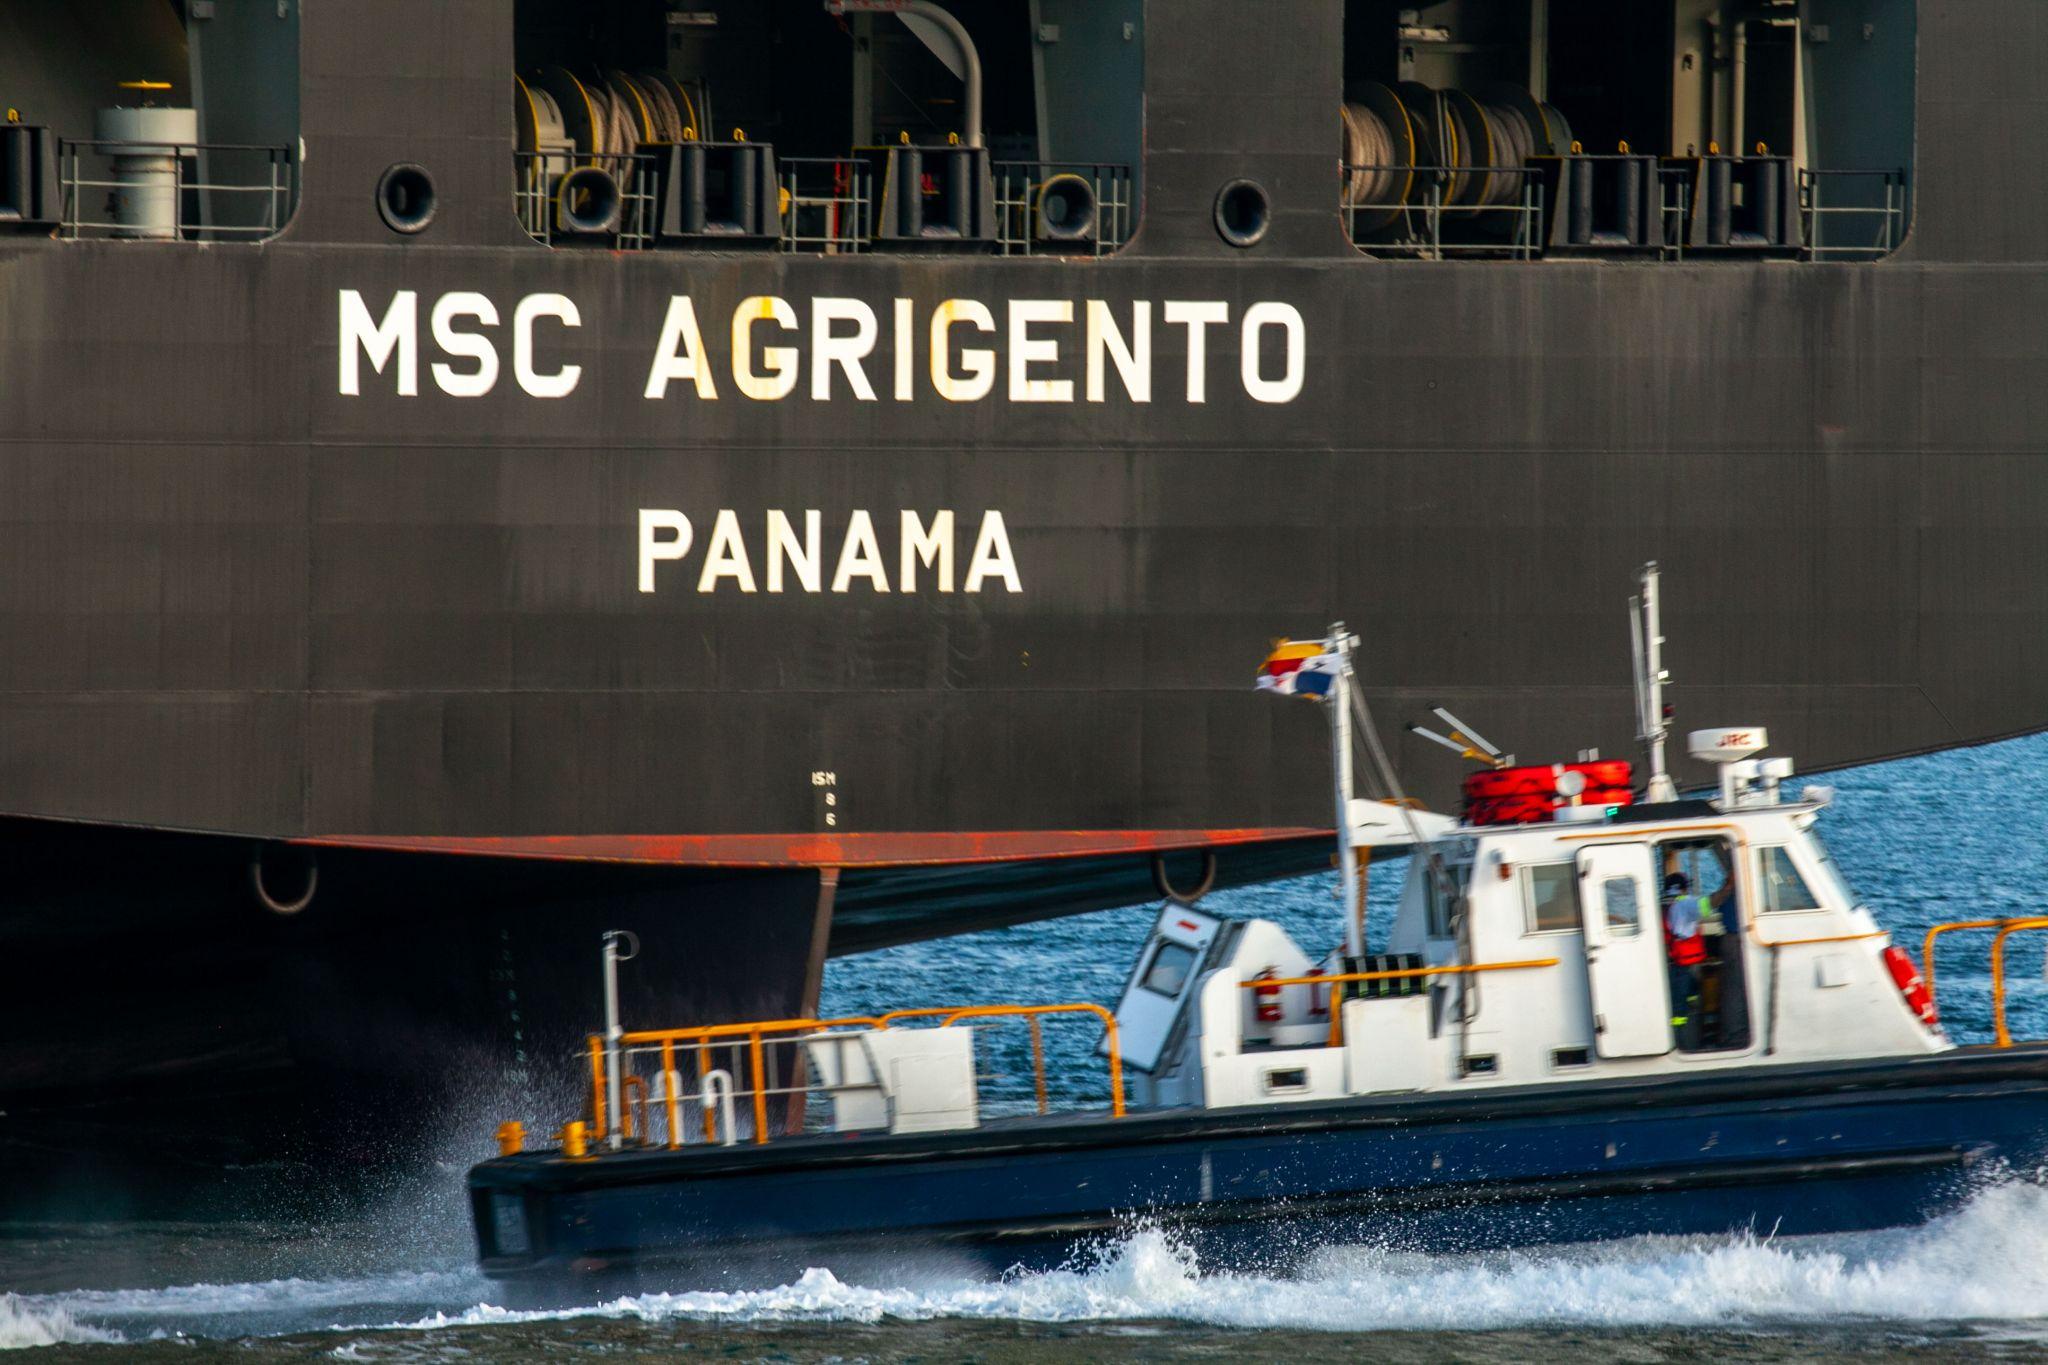 Pilot boat entrance to the Panama Canal, Panama